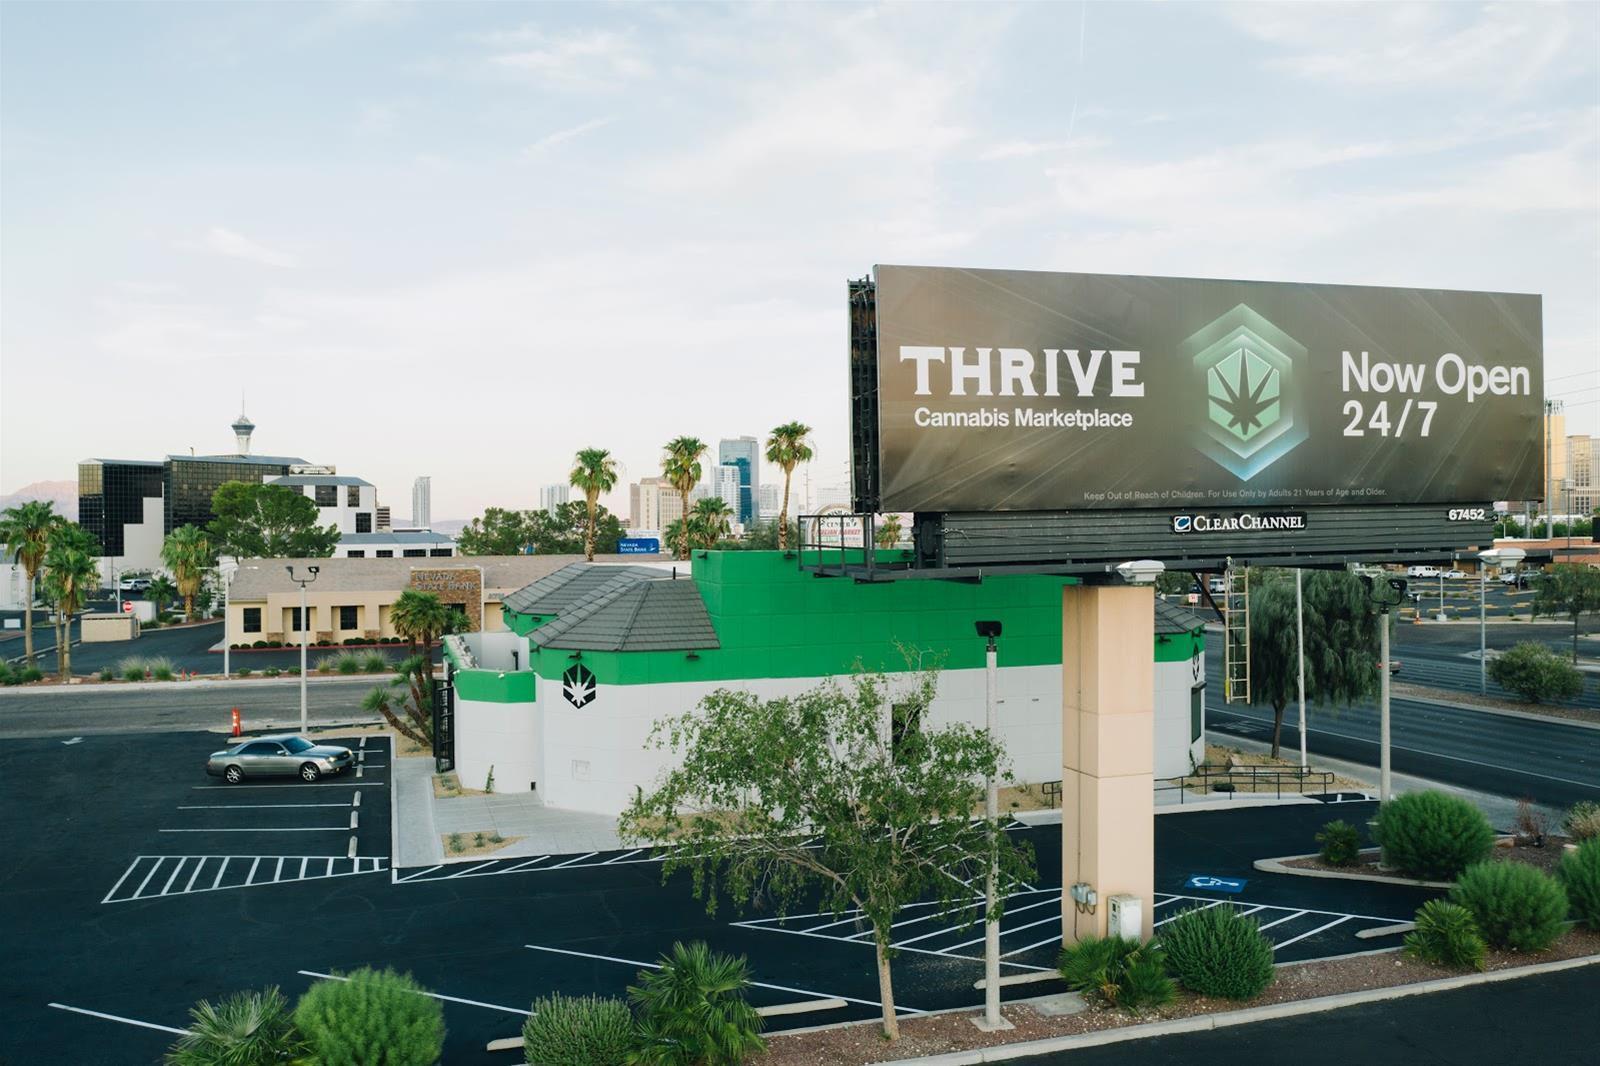 Thrive-Cannabis-Marketplace-W-Sahara-6